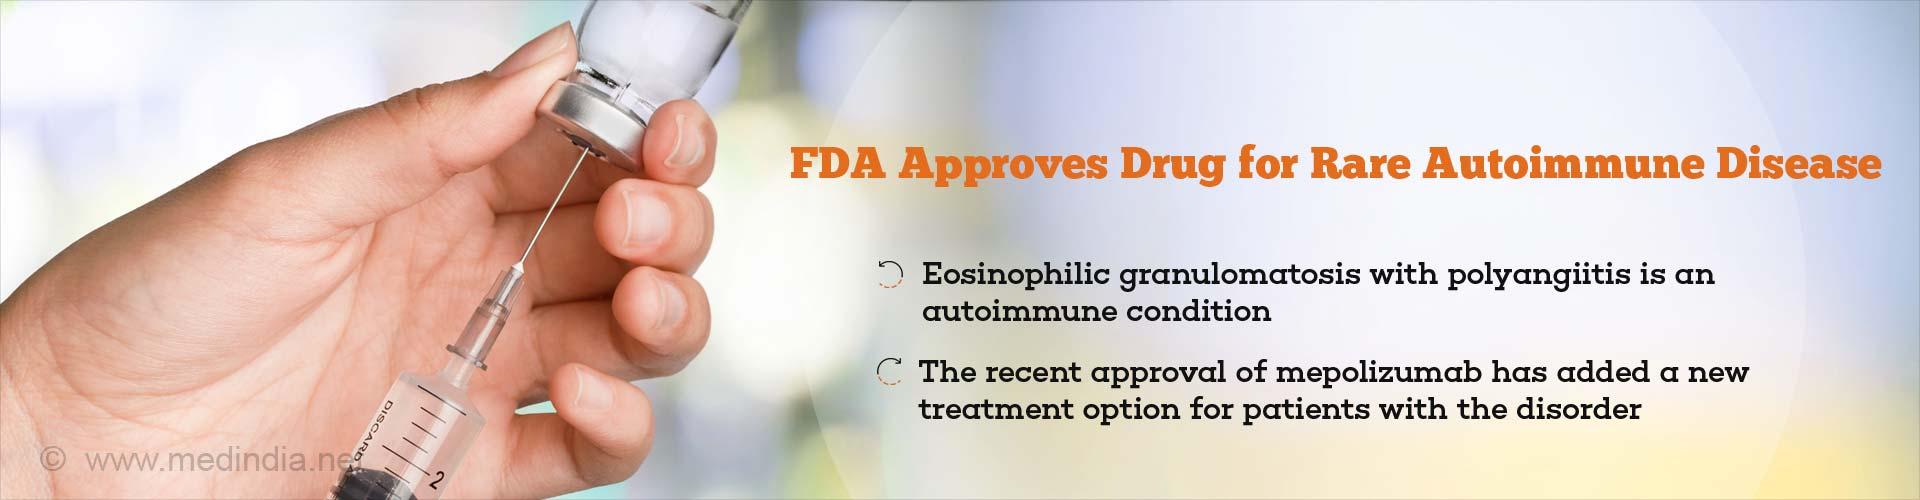 Mepolizumab Approved for Autoimmune Disorder - Eosinophilic Granulomatosis With Polyangiitis